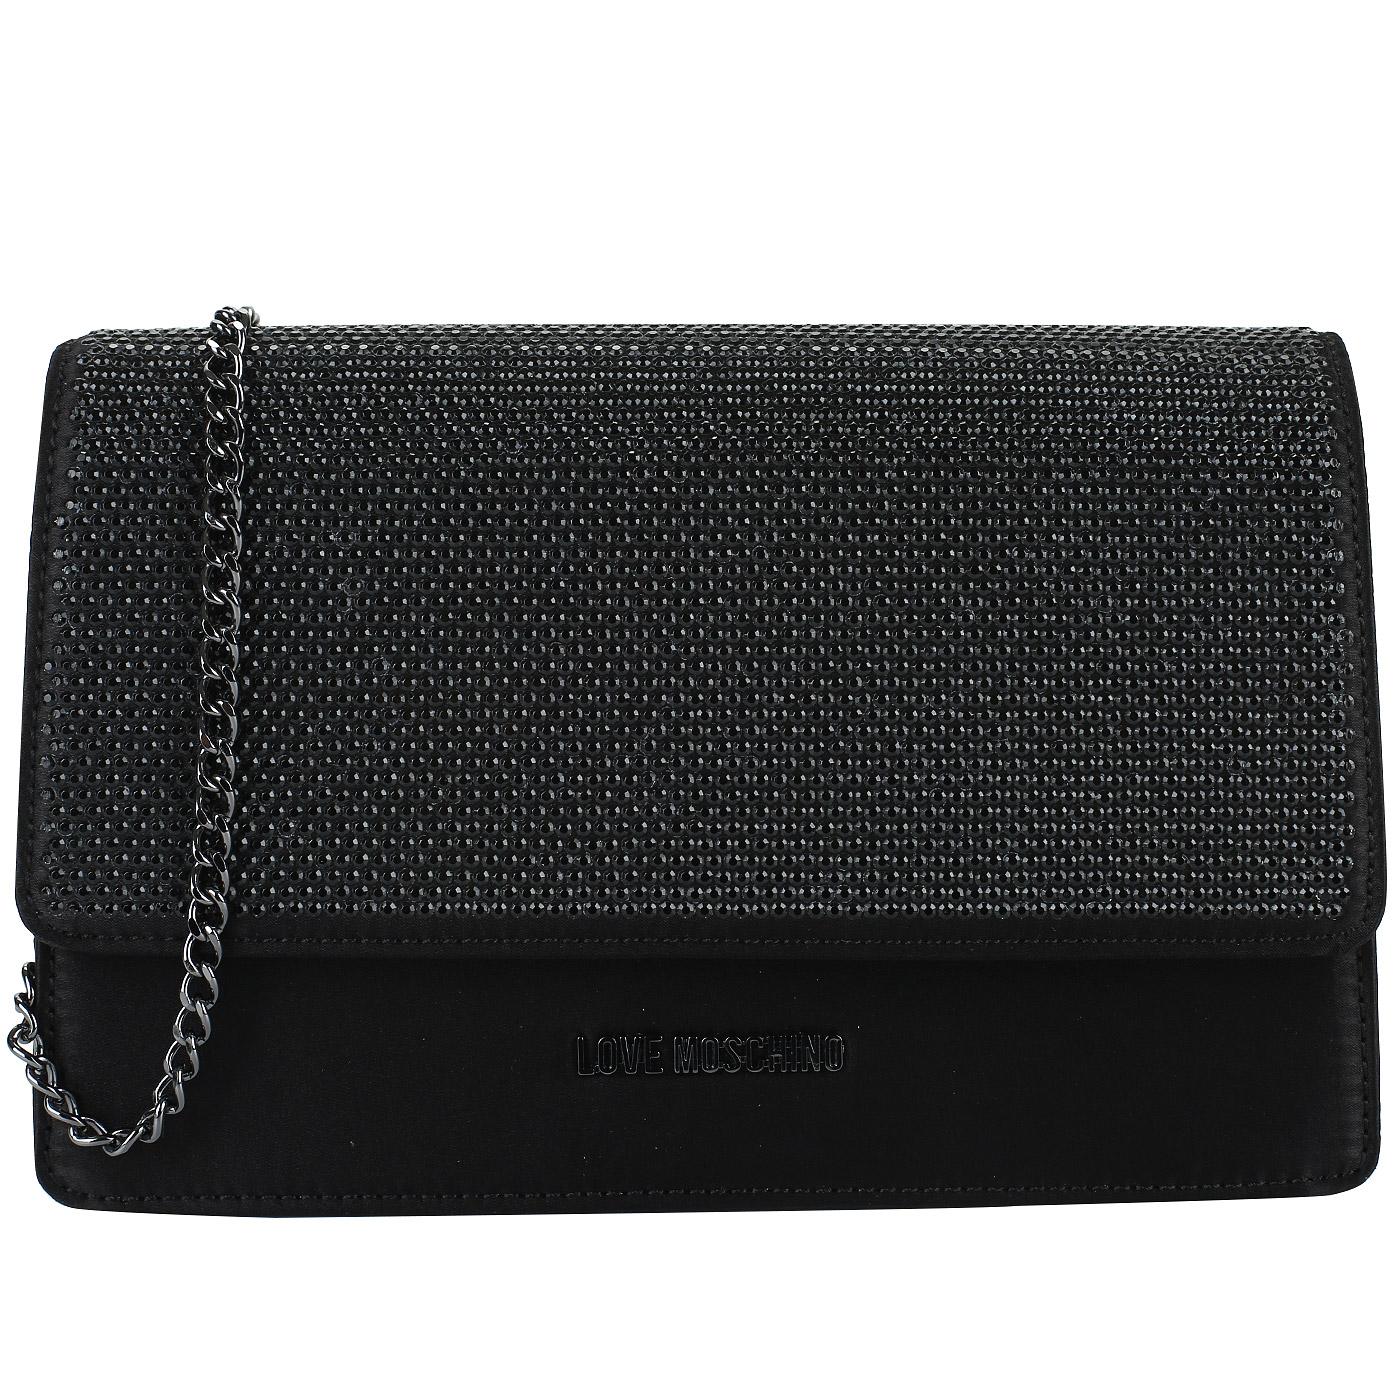 f76771a16804 Черный клатч на цепочке Love Moschino Evening bag JC4164PP16_000 ...